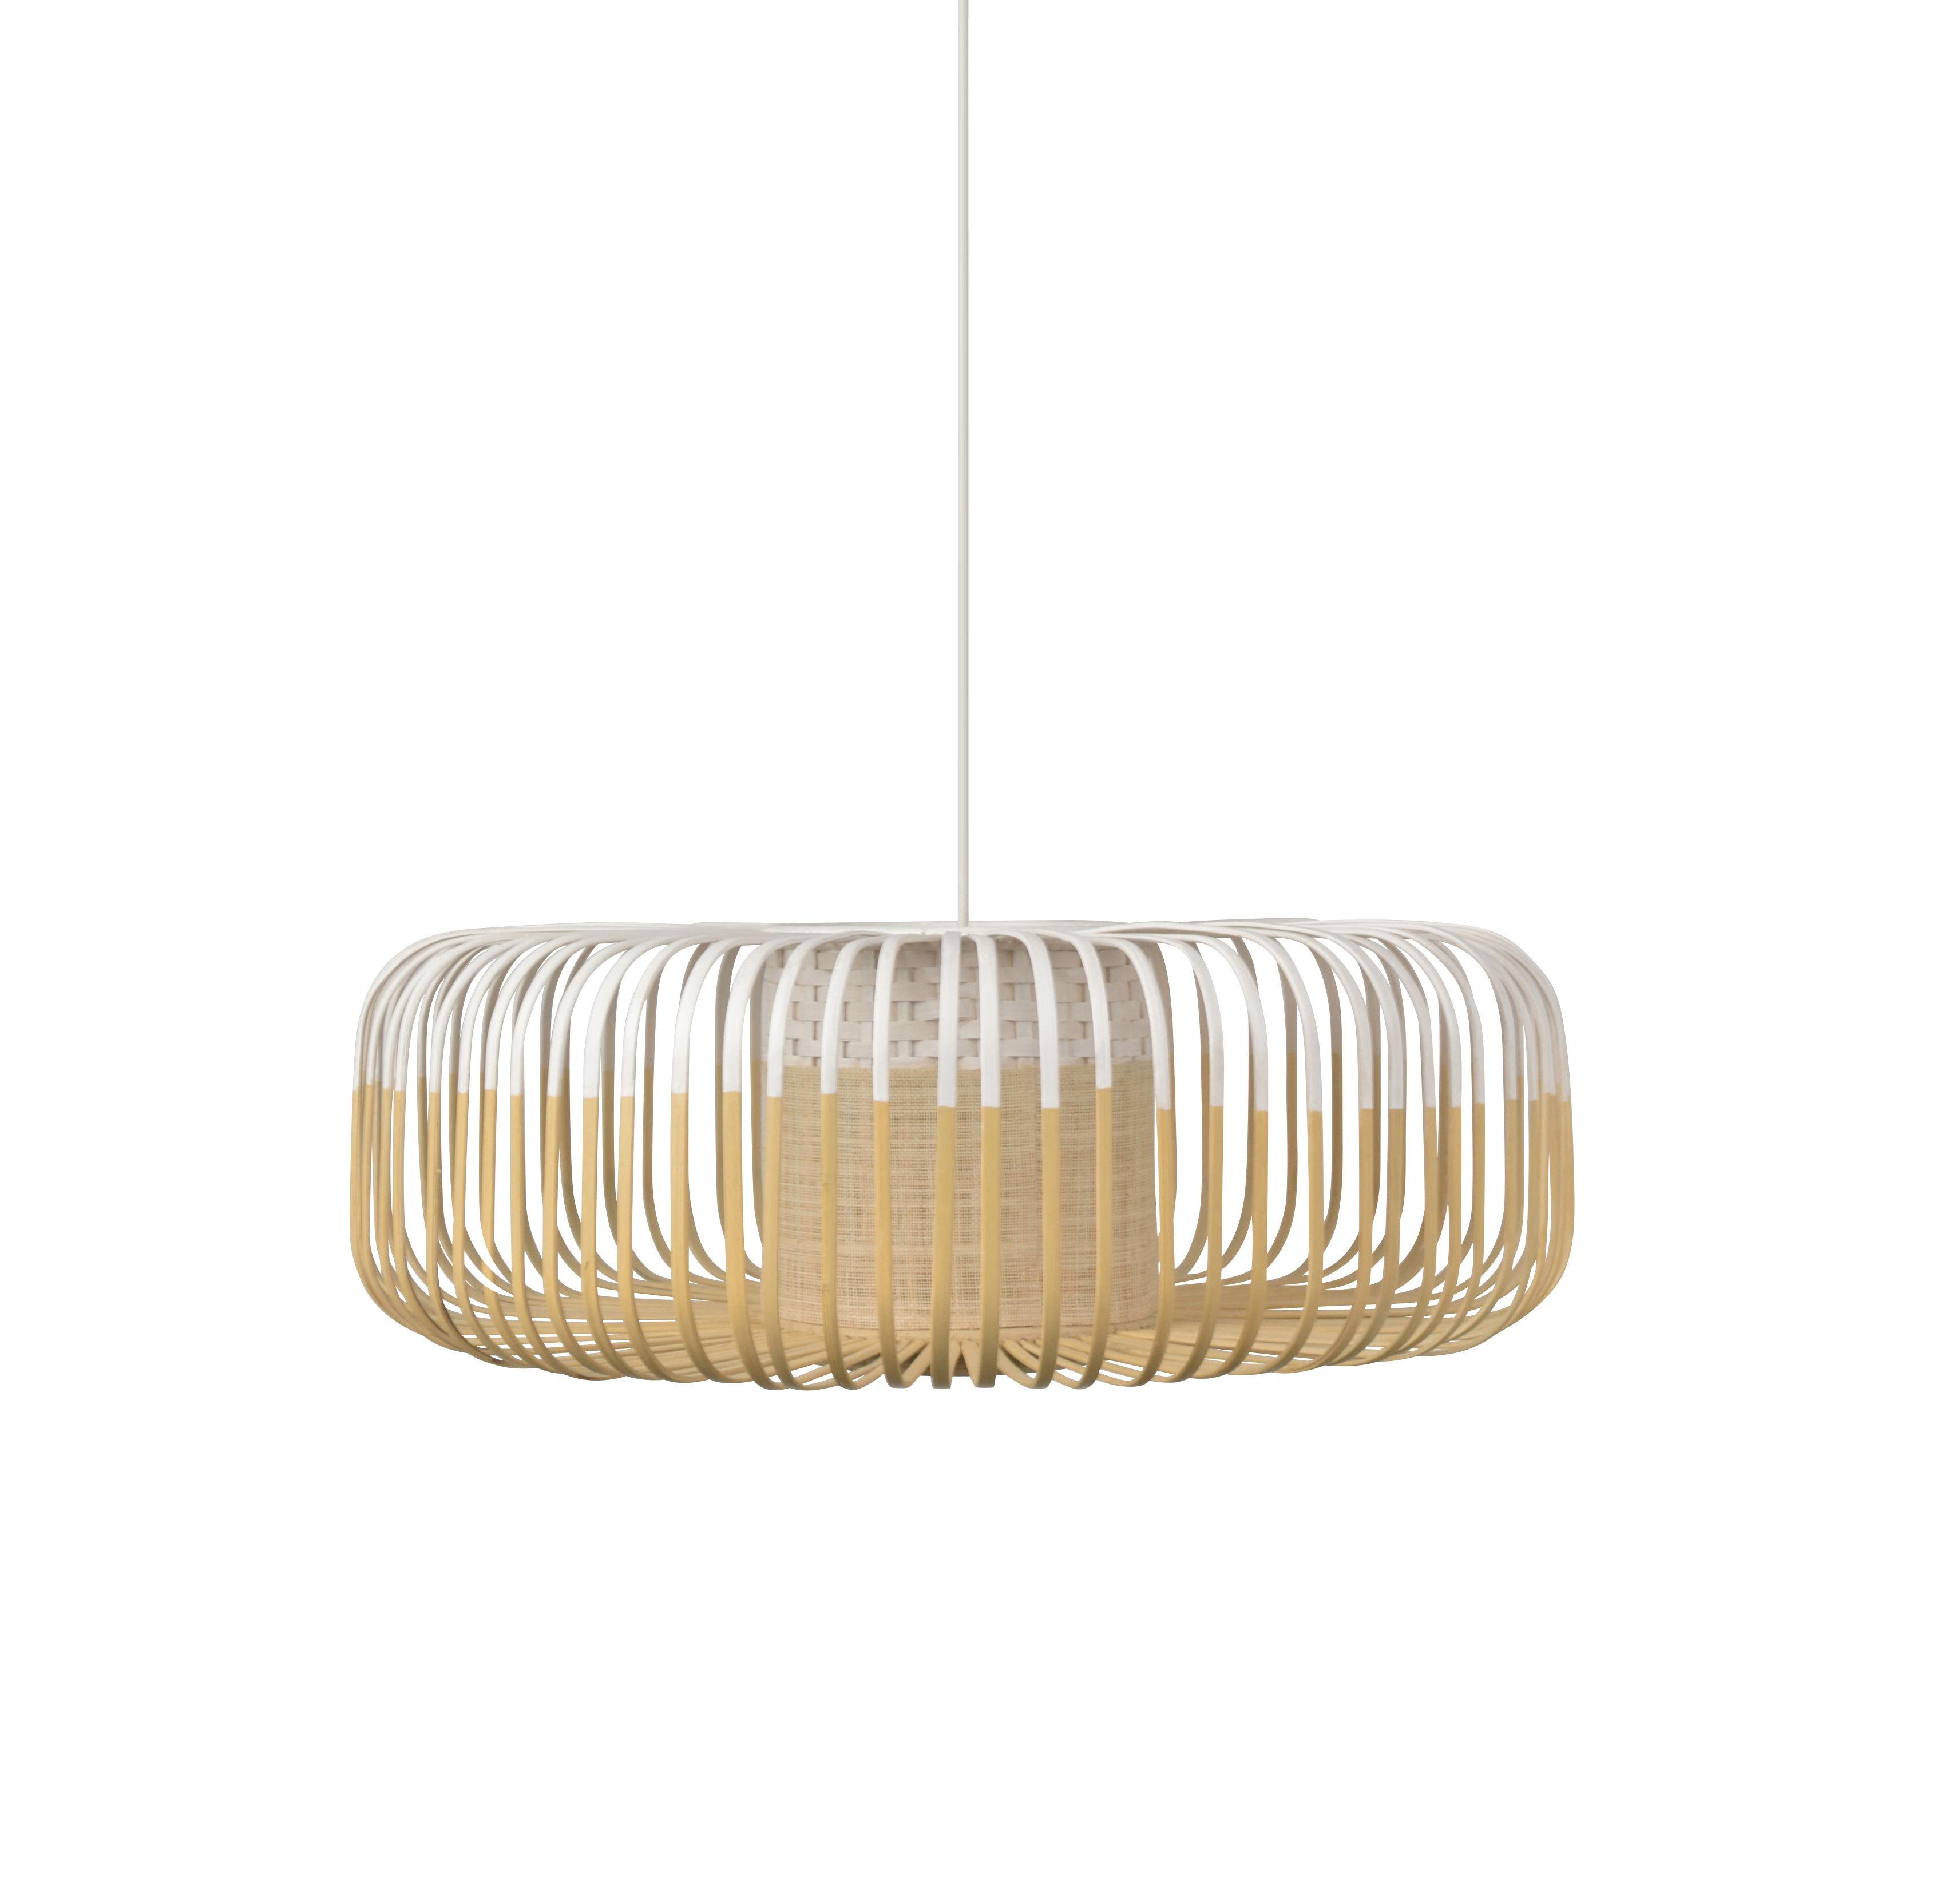 Illuminazione - Lampadari - Sospensione Bamboo XL - / Ø 60 cm di Forestier - Bianco - Bambù